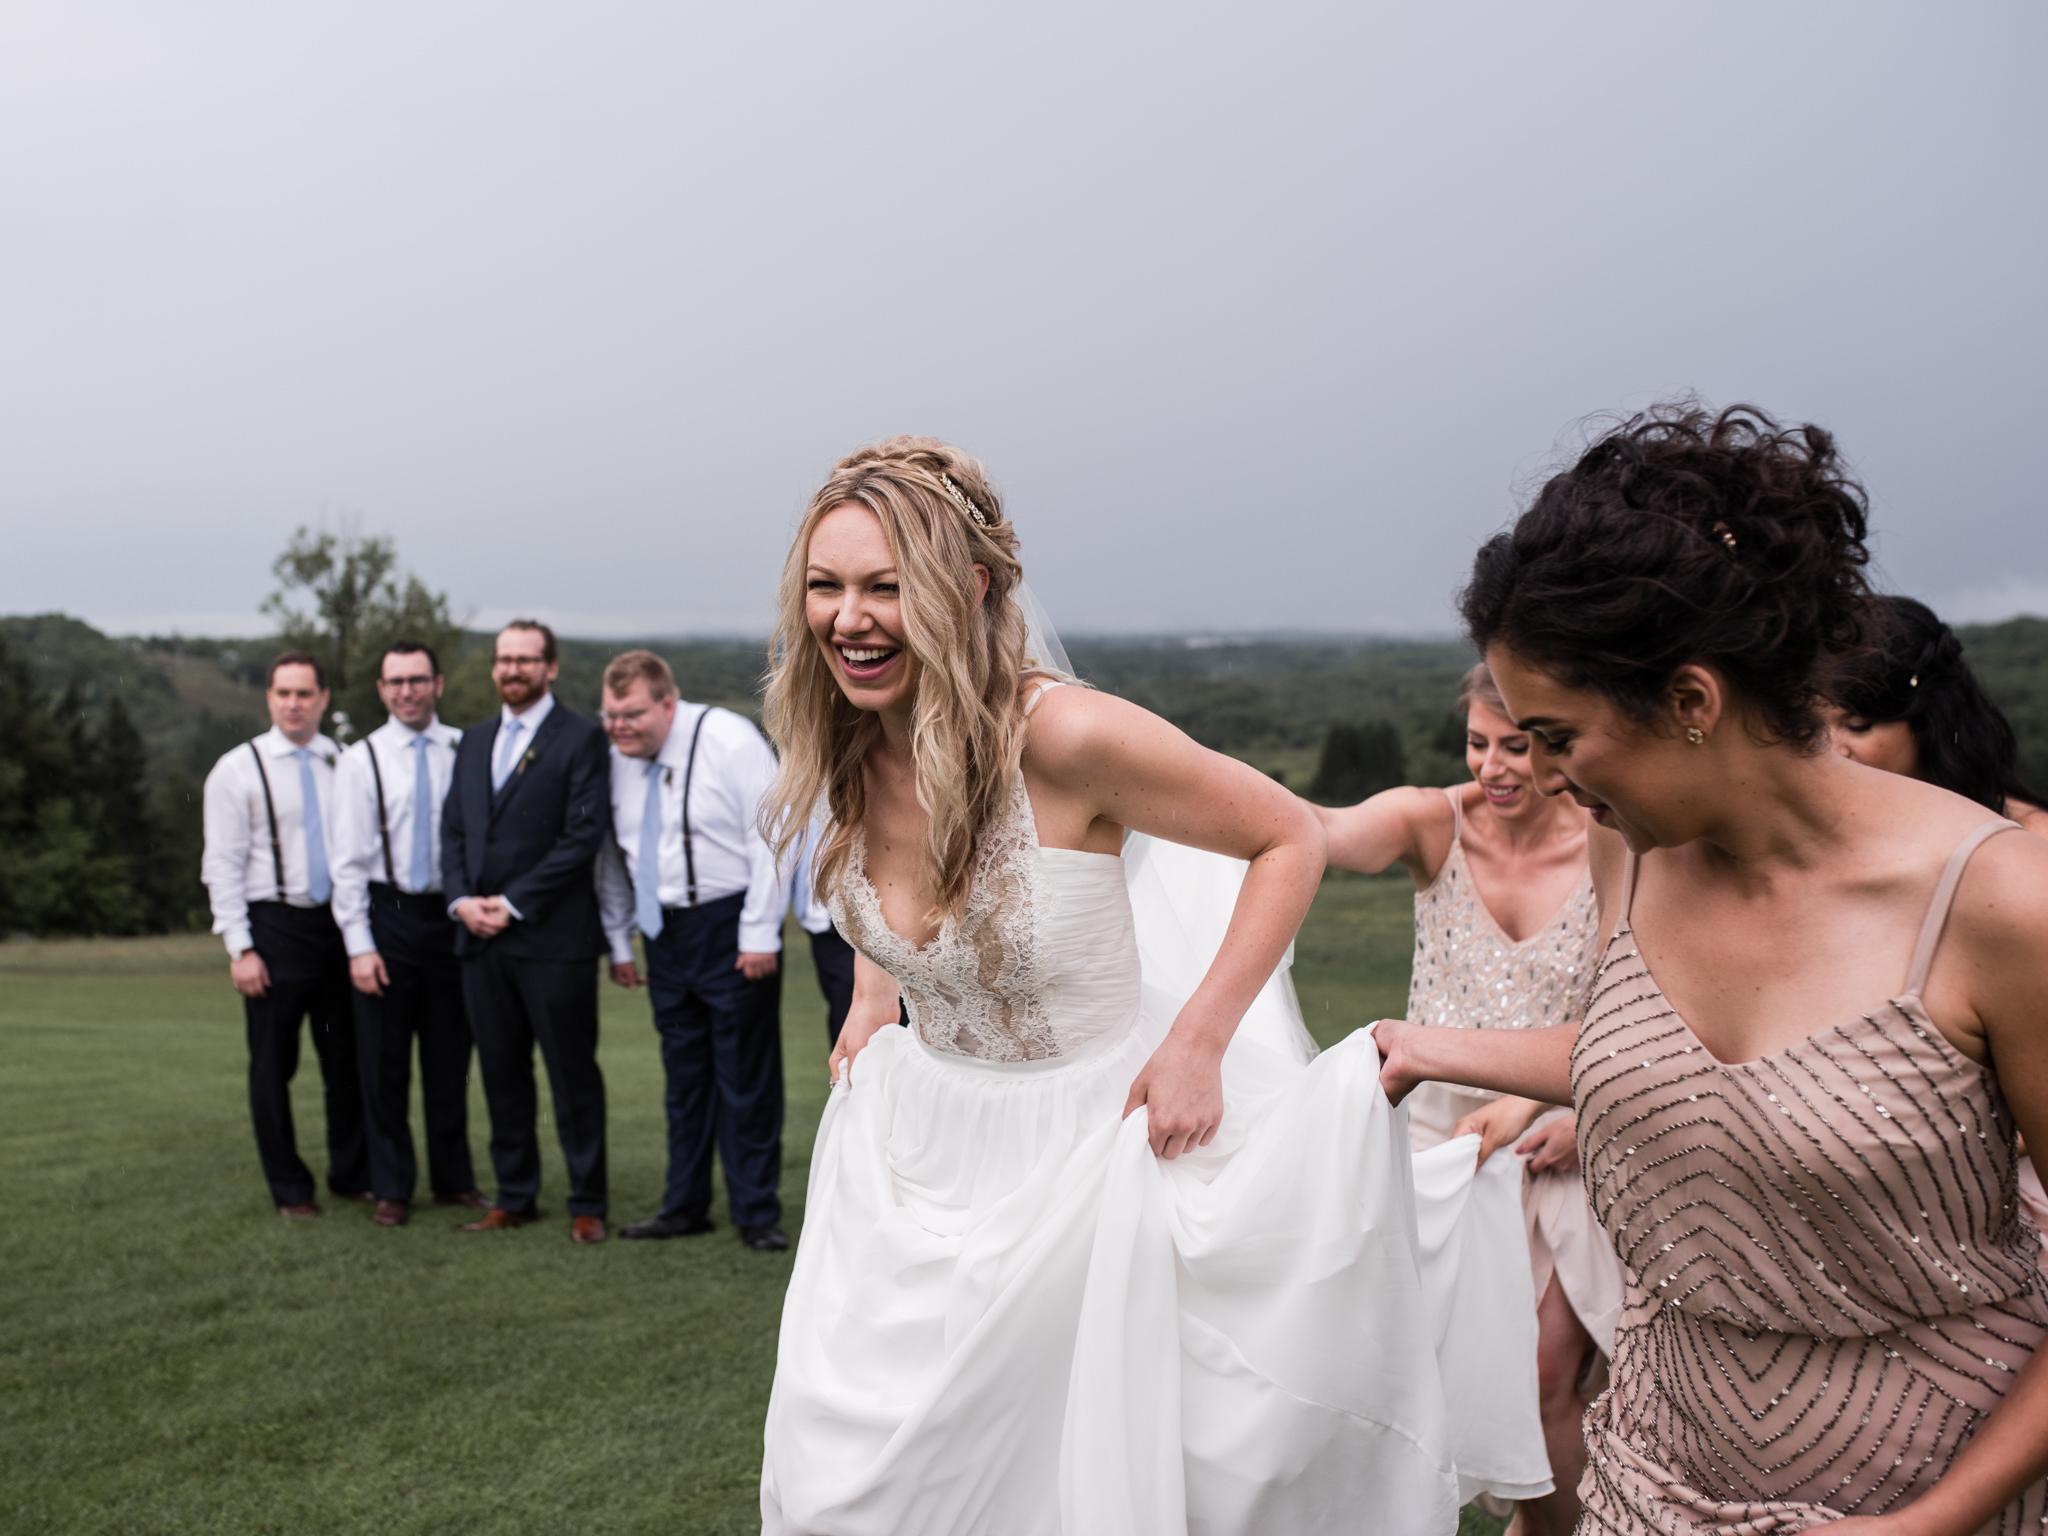 skyloft-wedding-toronto-wedding-photographer-23.jpg